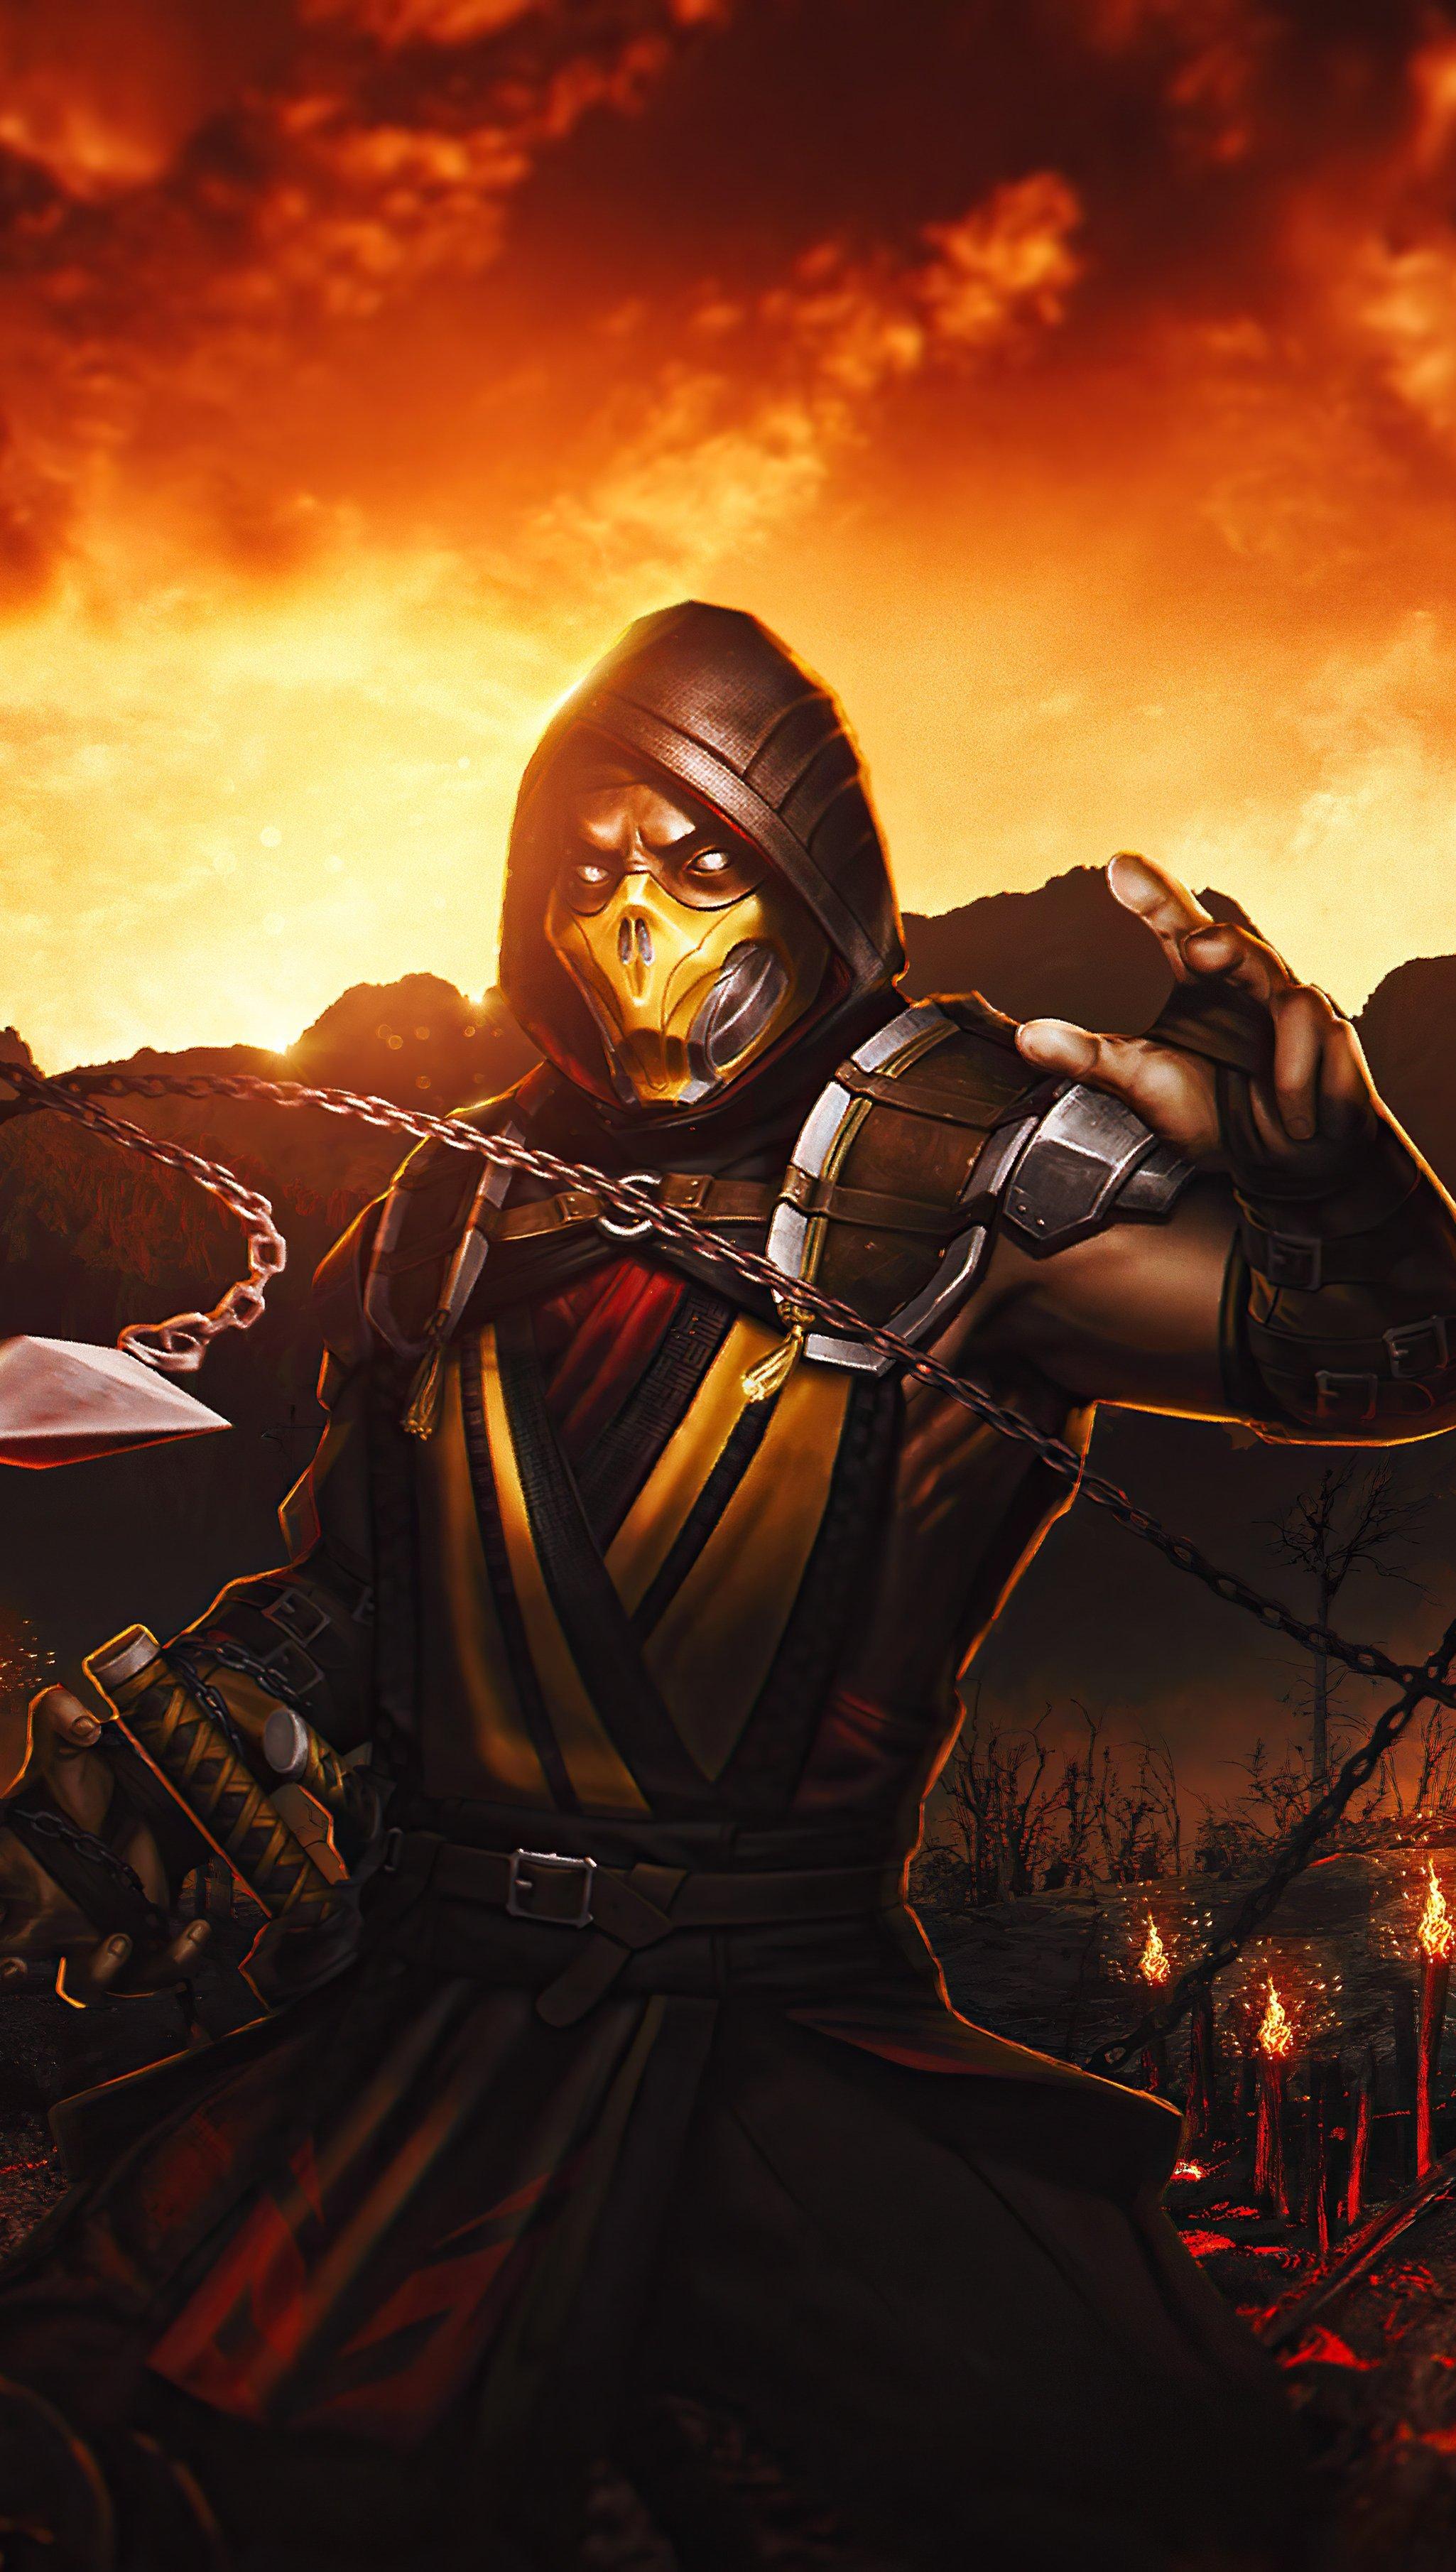 Fondos de pantalla Mortal Kombat Scorpion Samurai Vertical